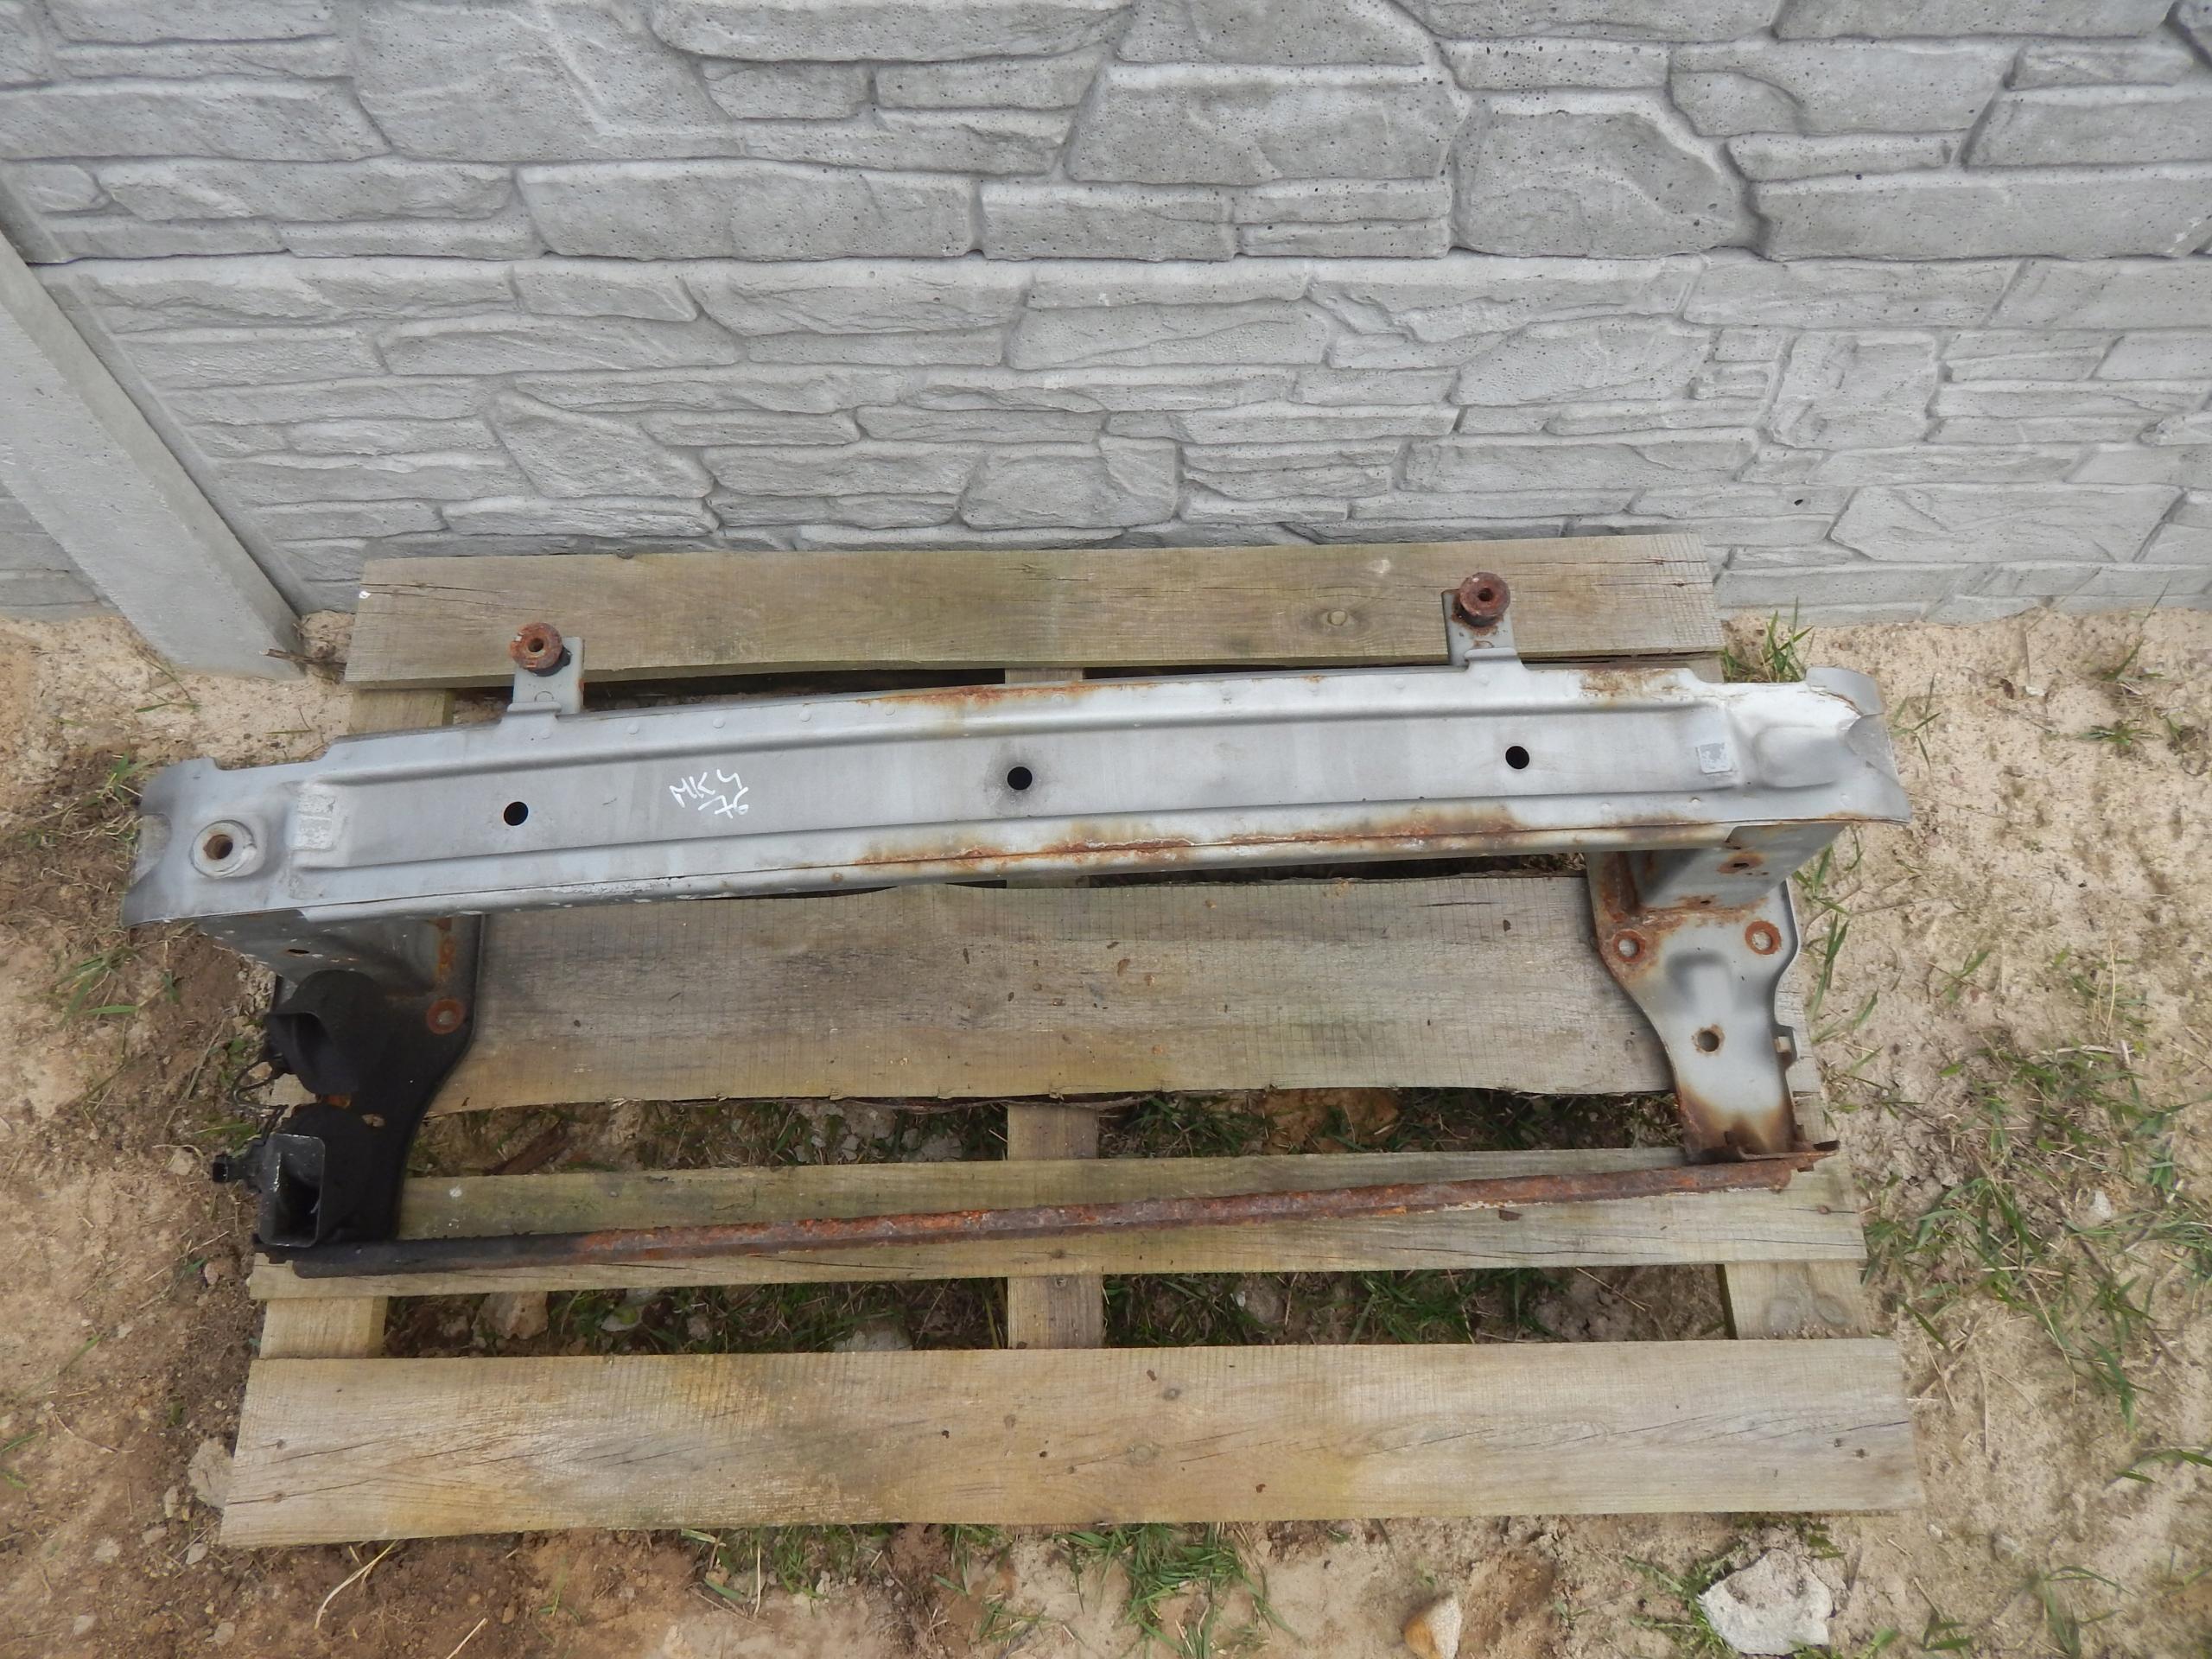 BALKIS PO BAMPERIS (BUFERIS) MONDEO MK4 S-MAX GALAXY MK3 76